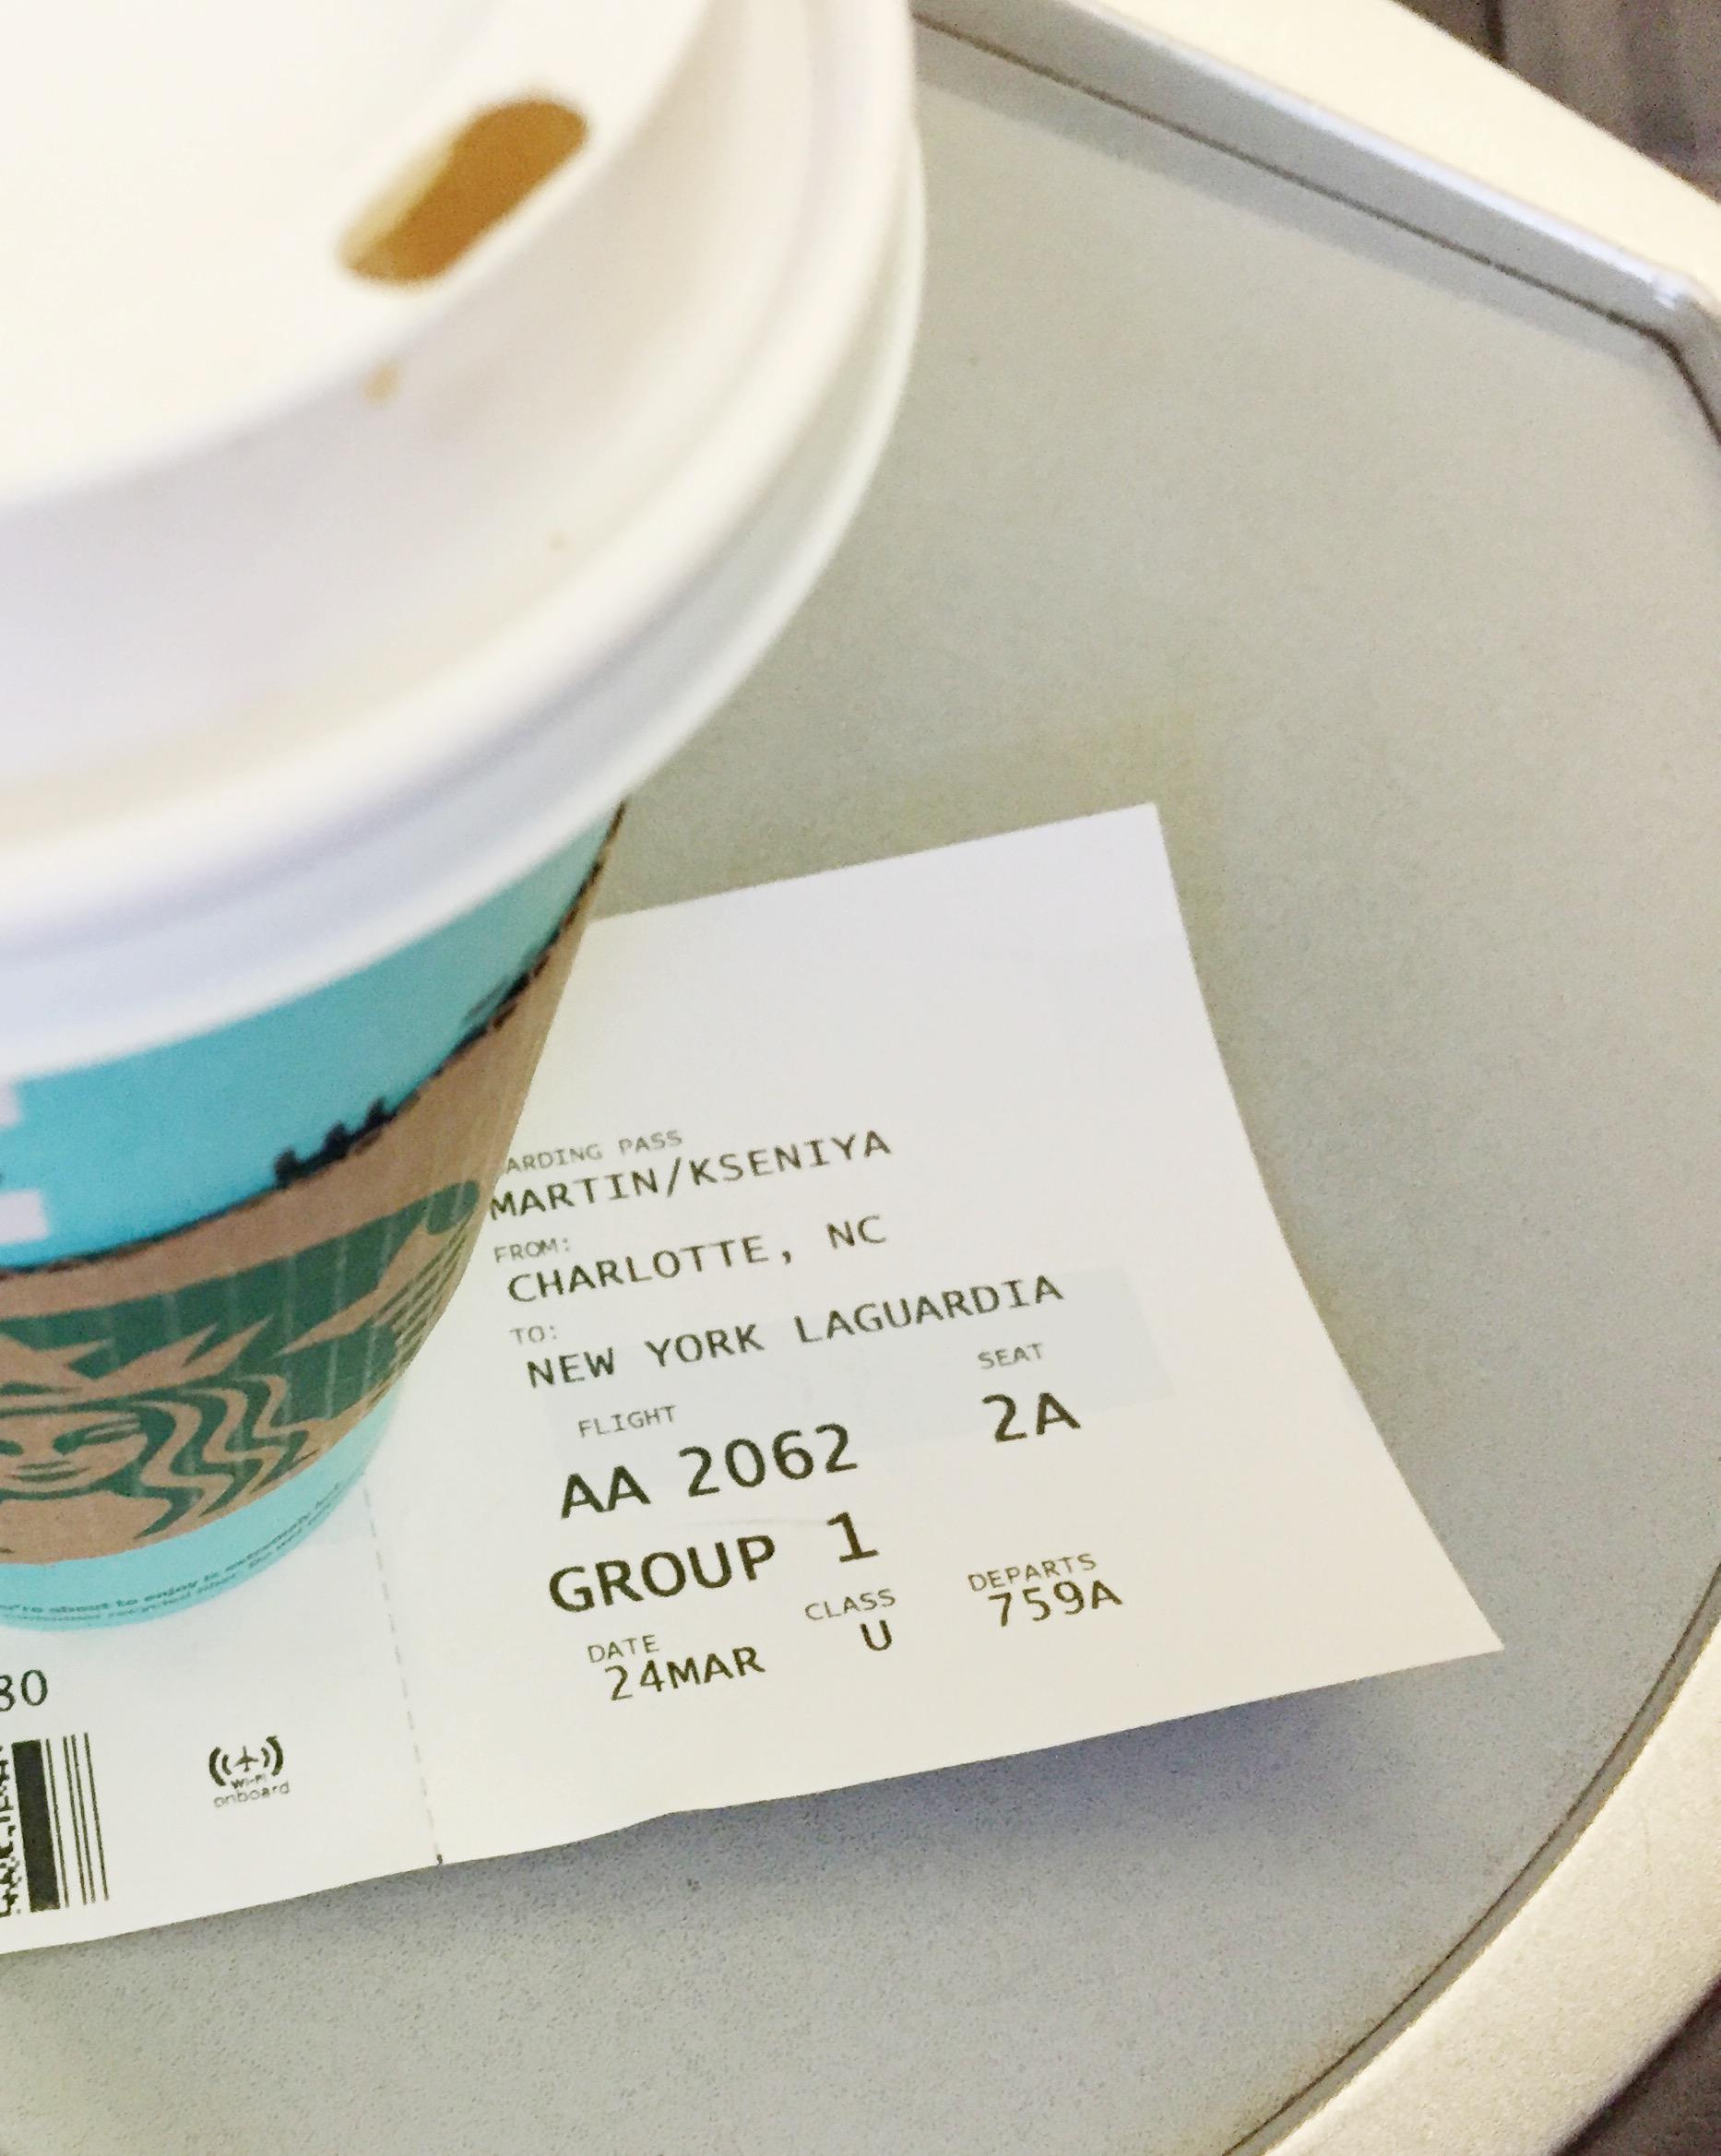 early-morning-flight-clt-lga-seat-2a-nyc